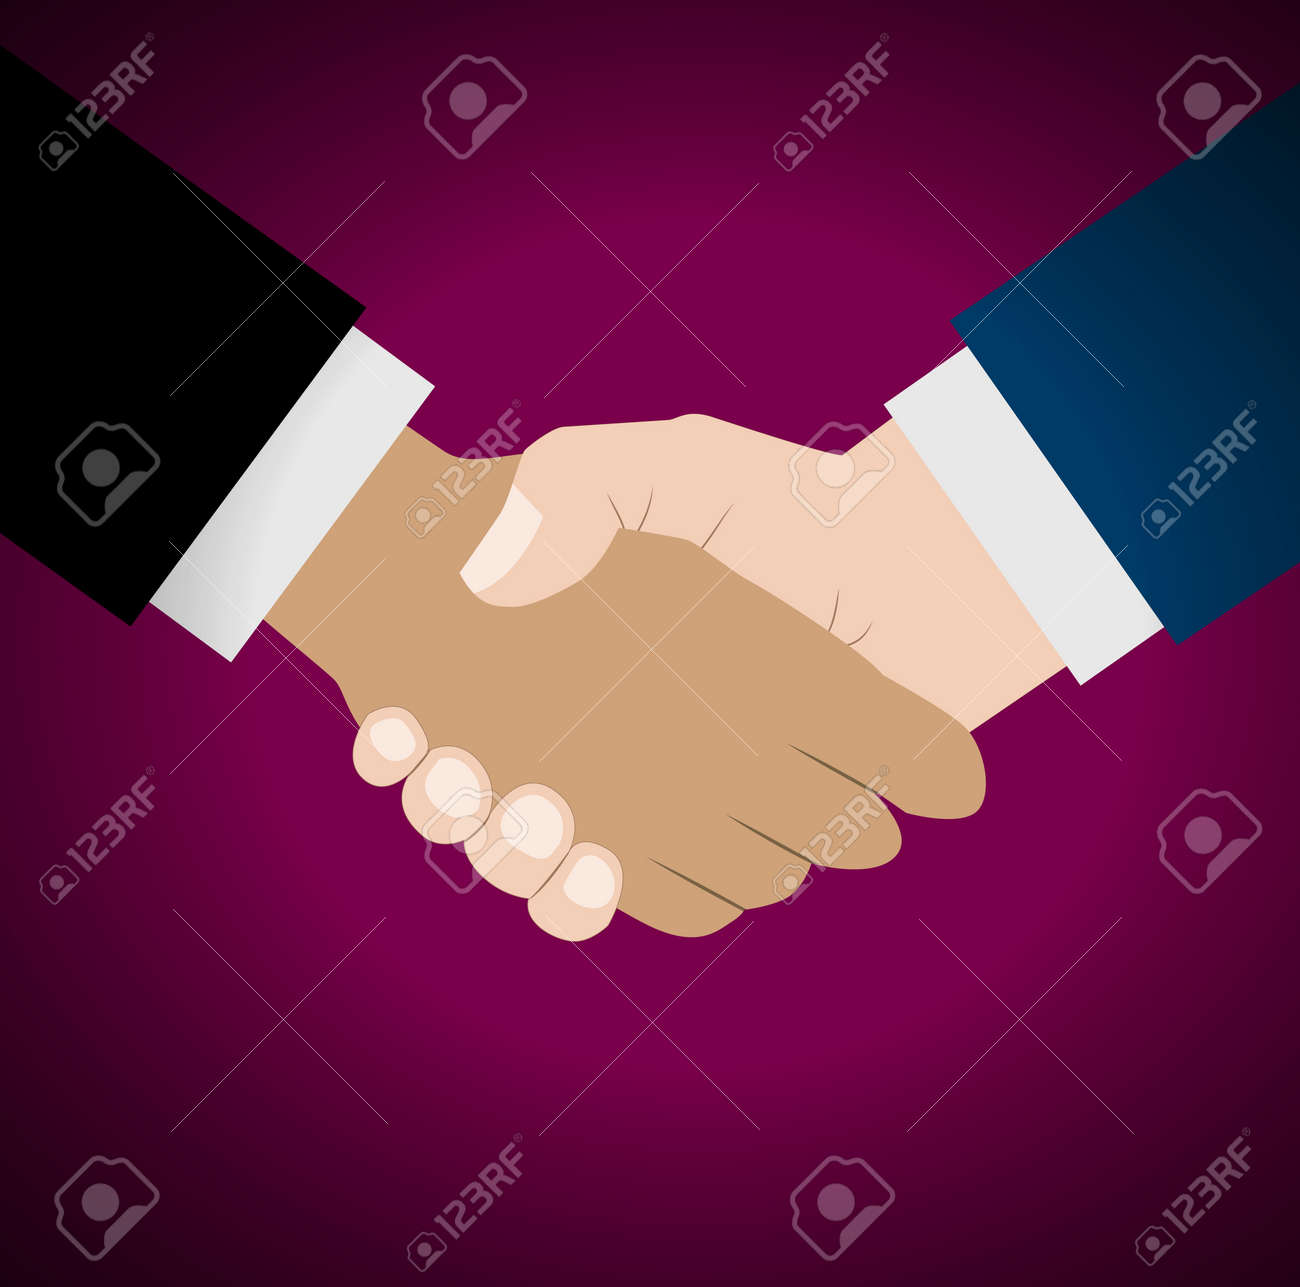 Handshake vector illustration. Background for business and finance - 60302406